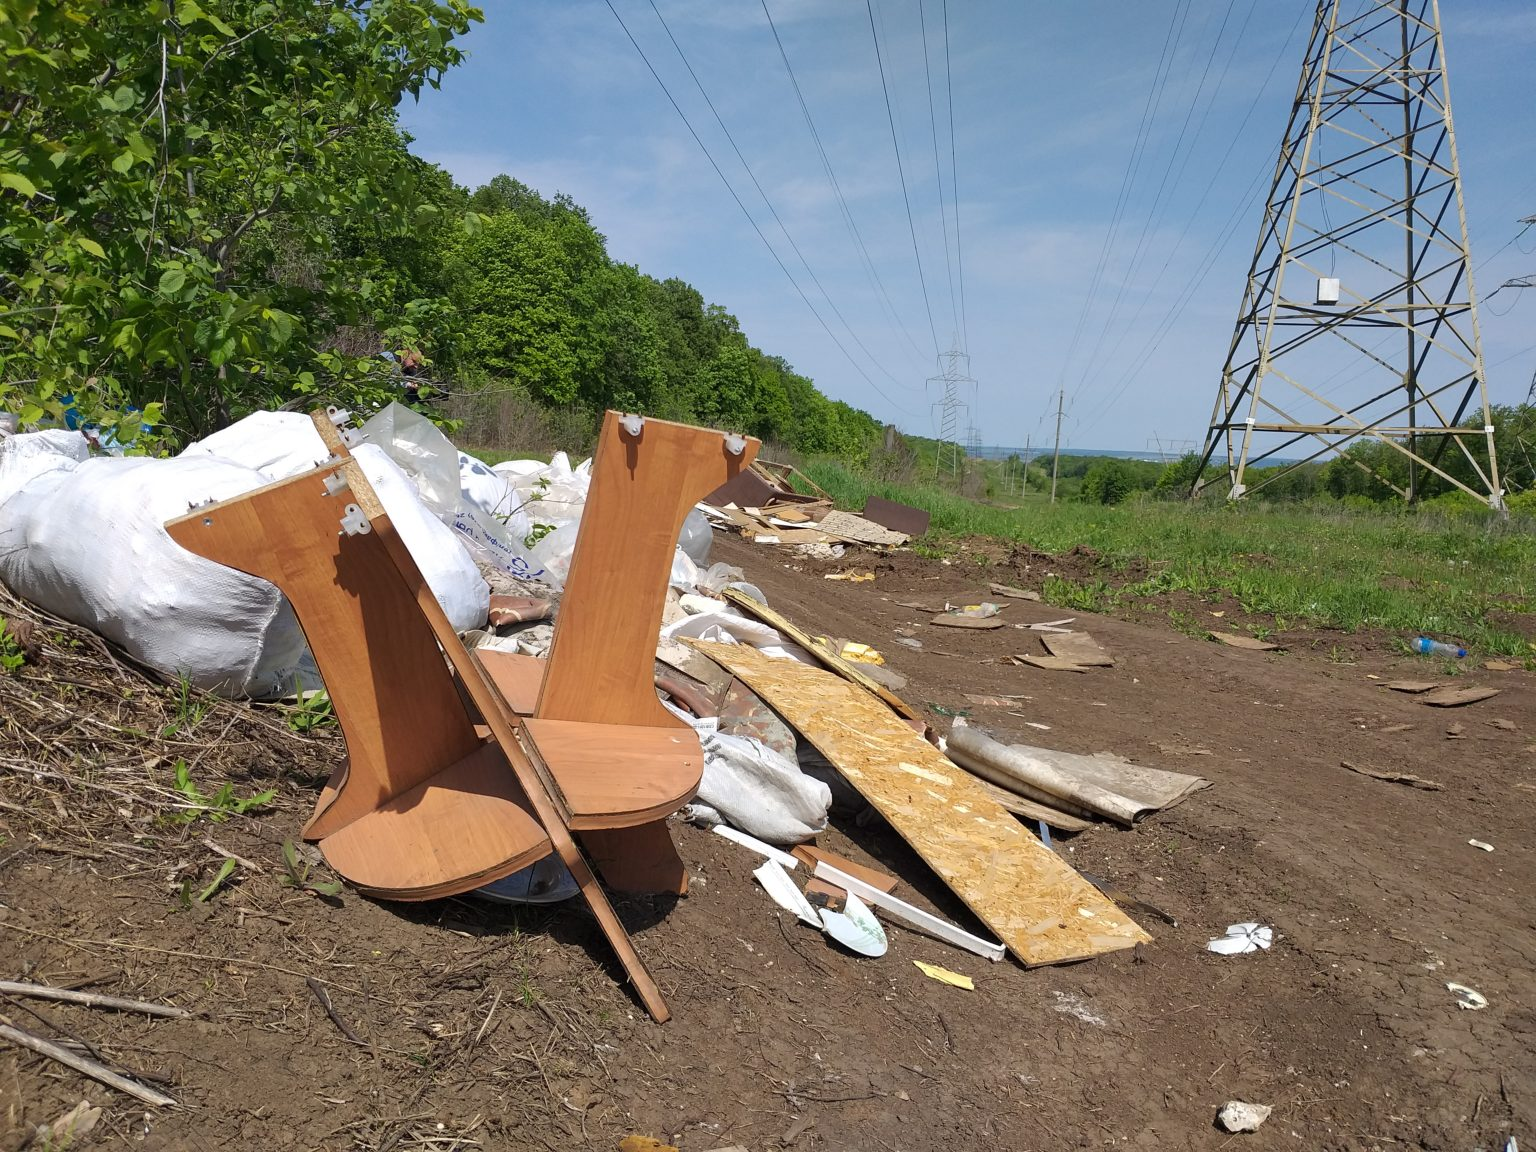 В «ЭкоСтройРесурс» объяснили, почему вблизи дач растут свалки мусора